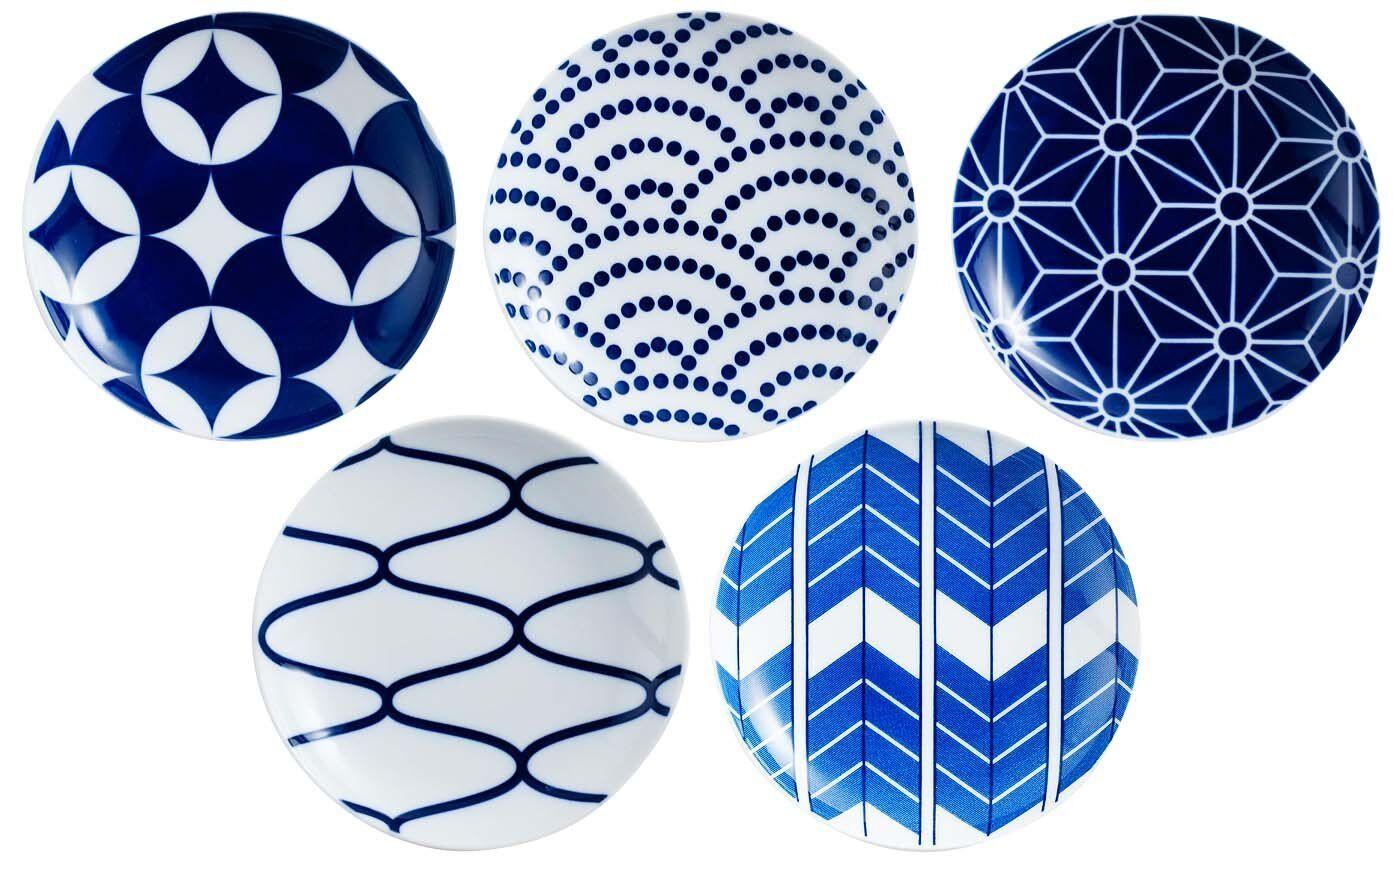 Kihara Komon Vaisselle Petit Plat 5 Pièces Set 0079 from Japan